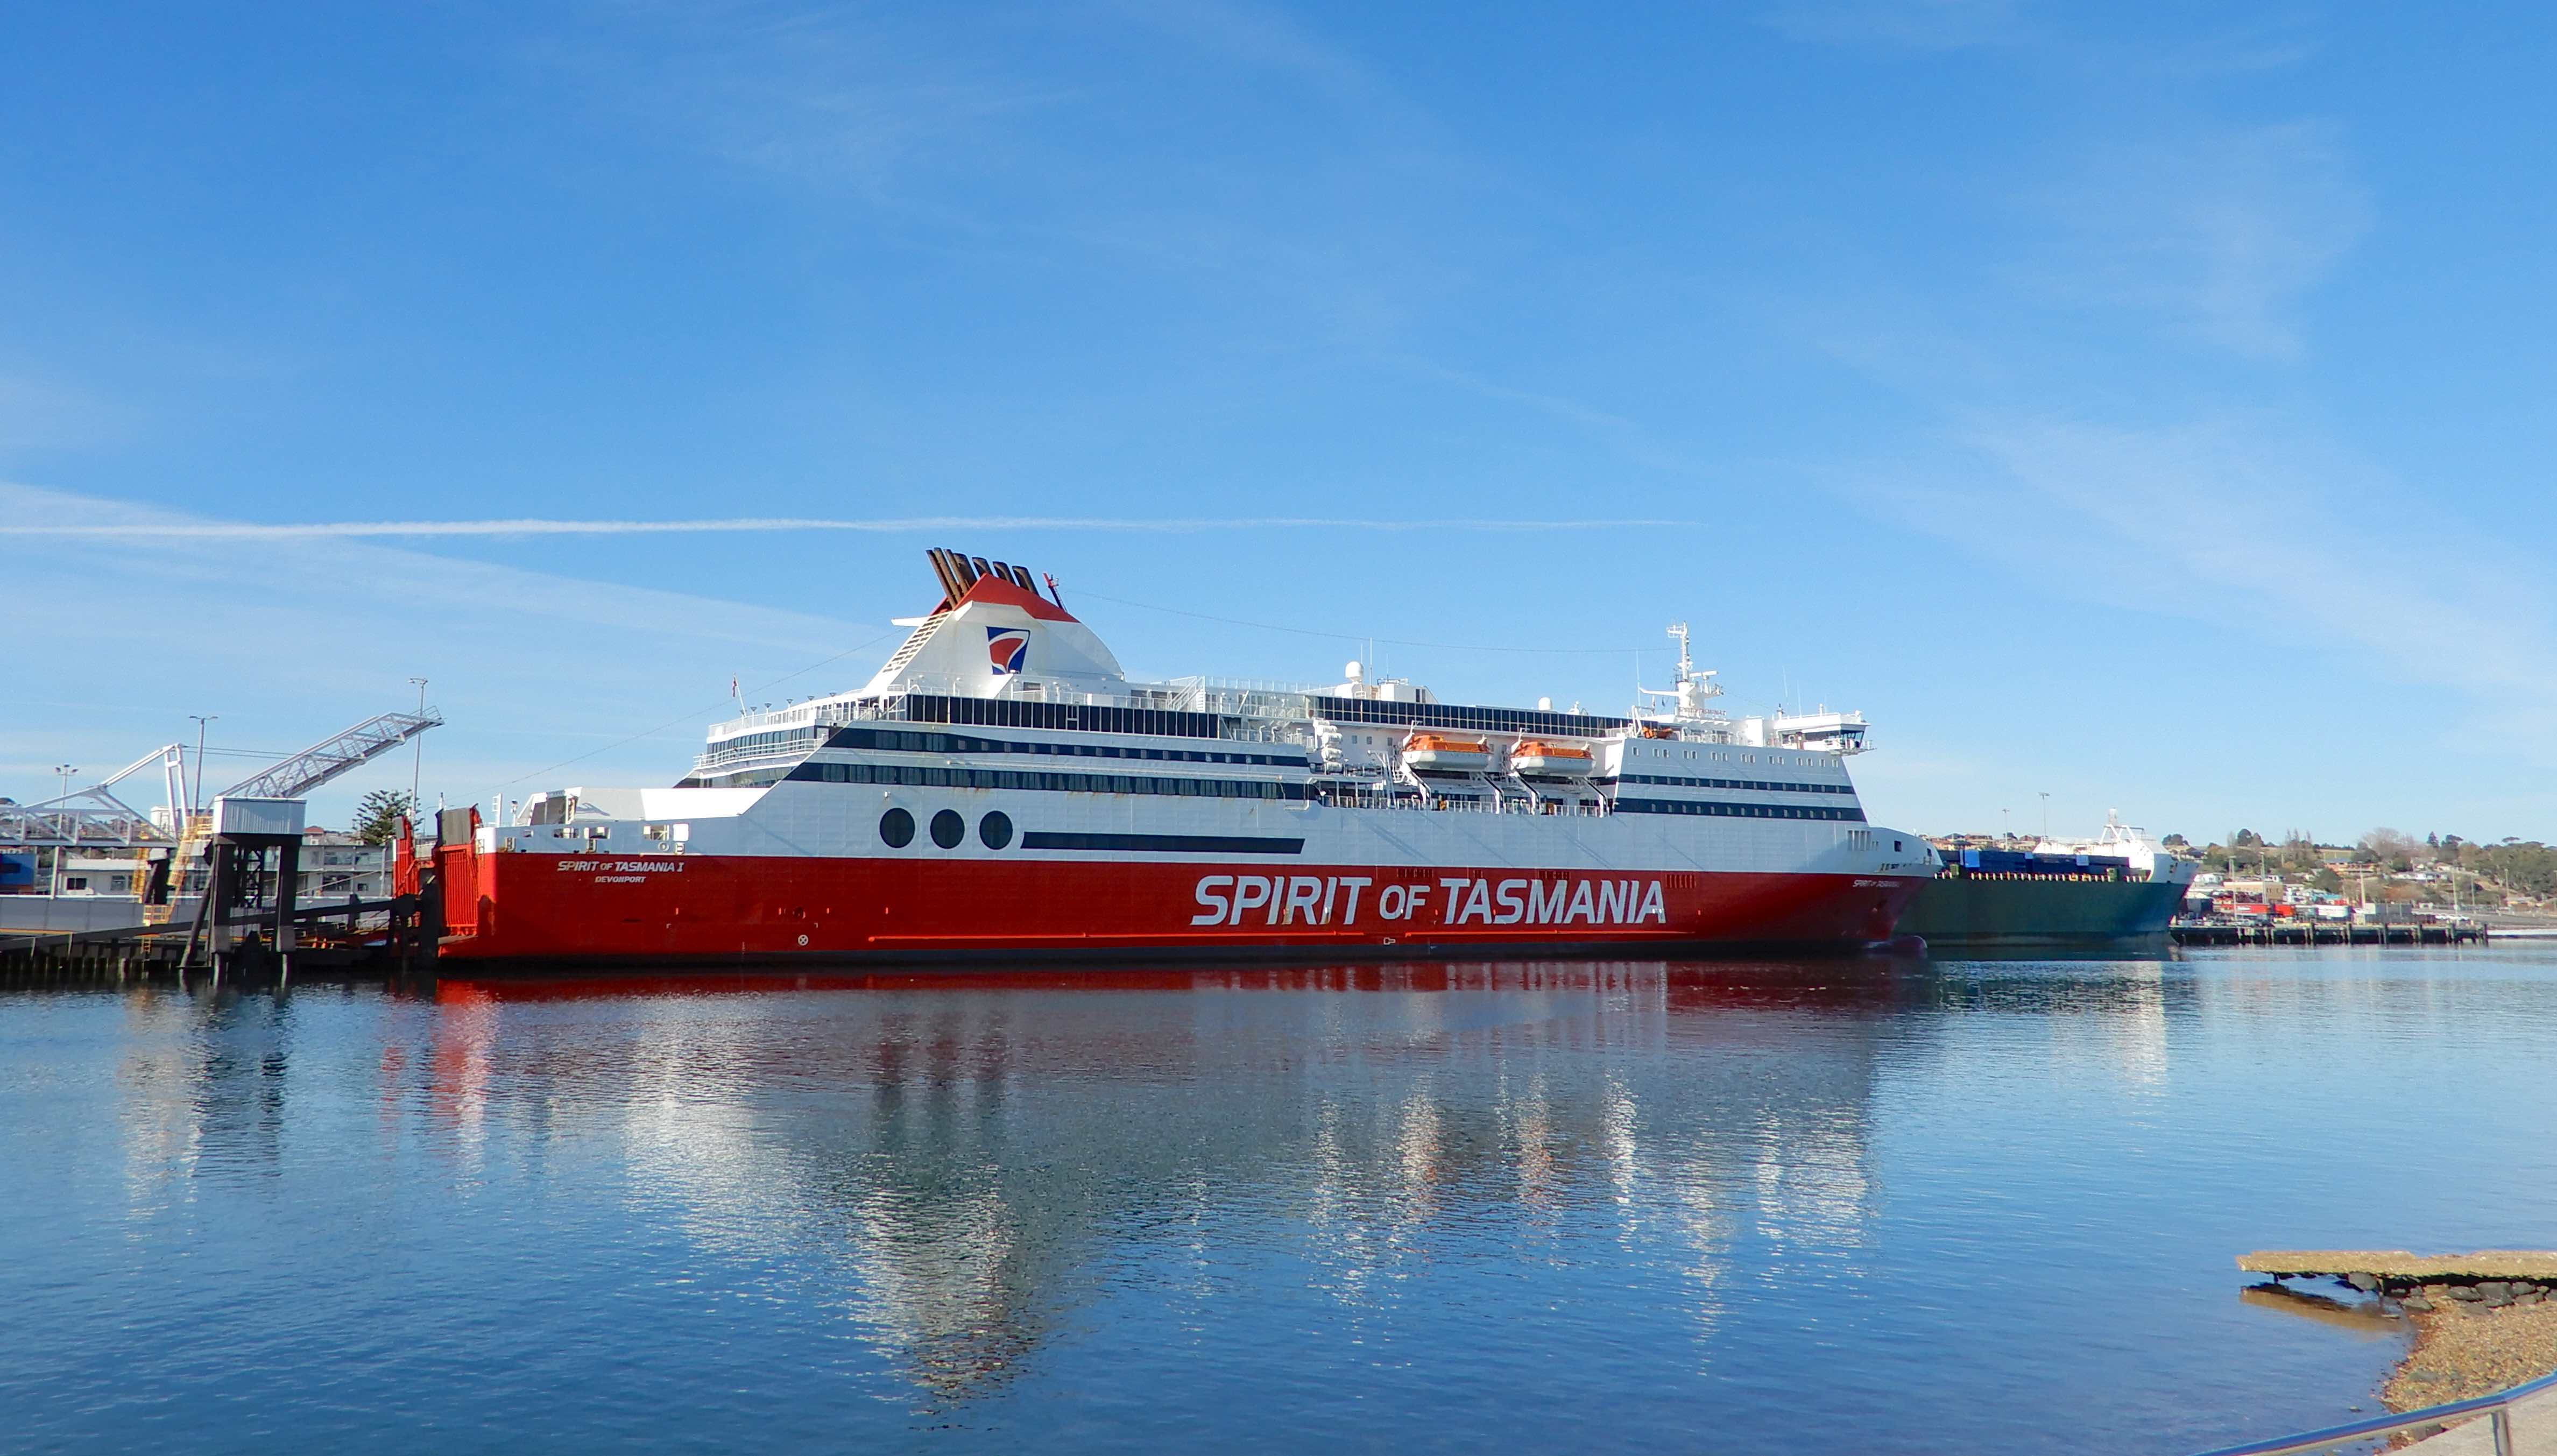 5.Spirit of Tasmania